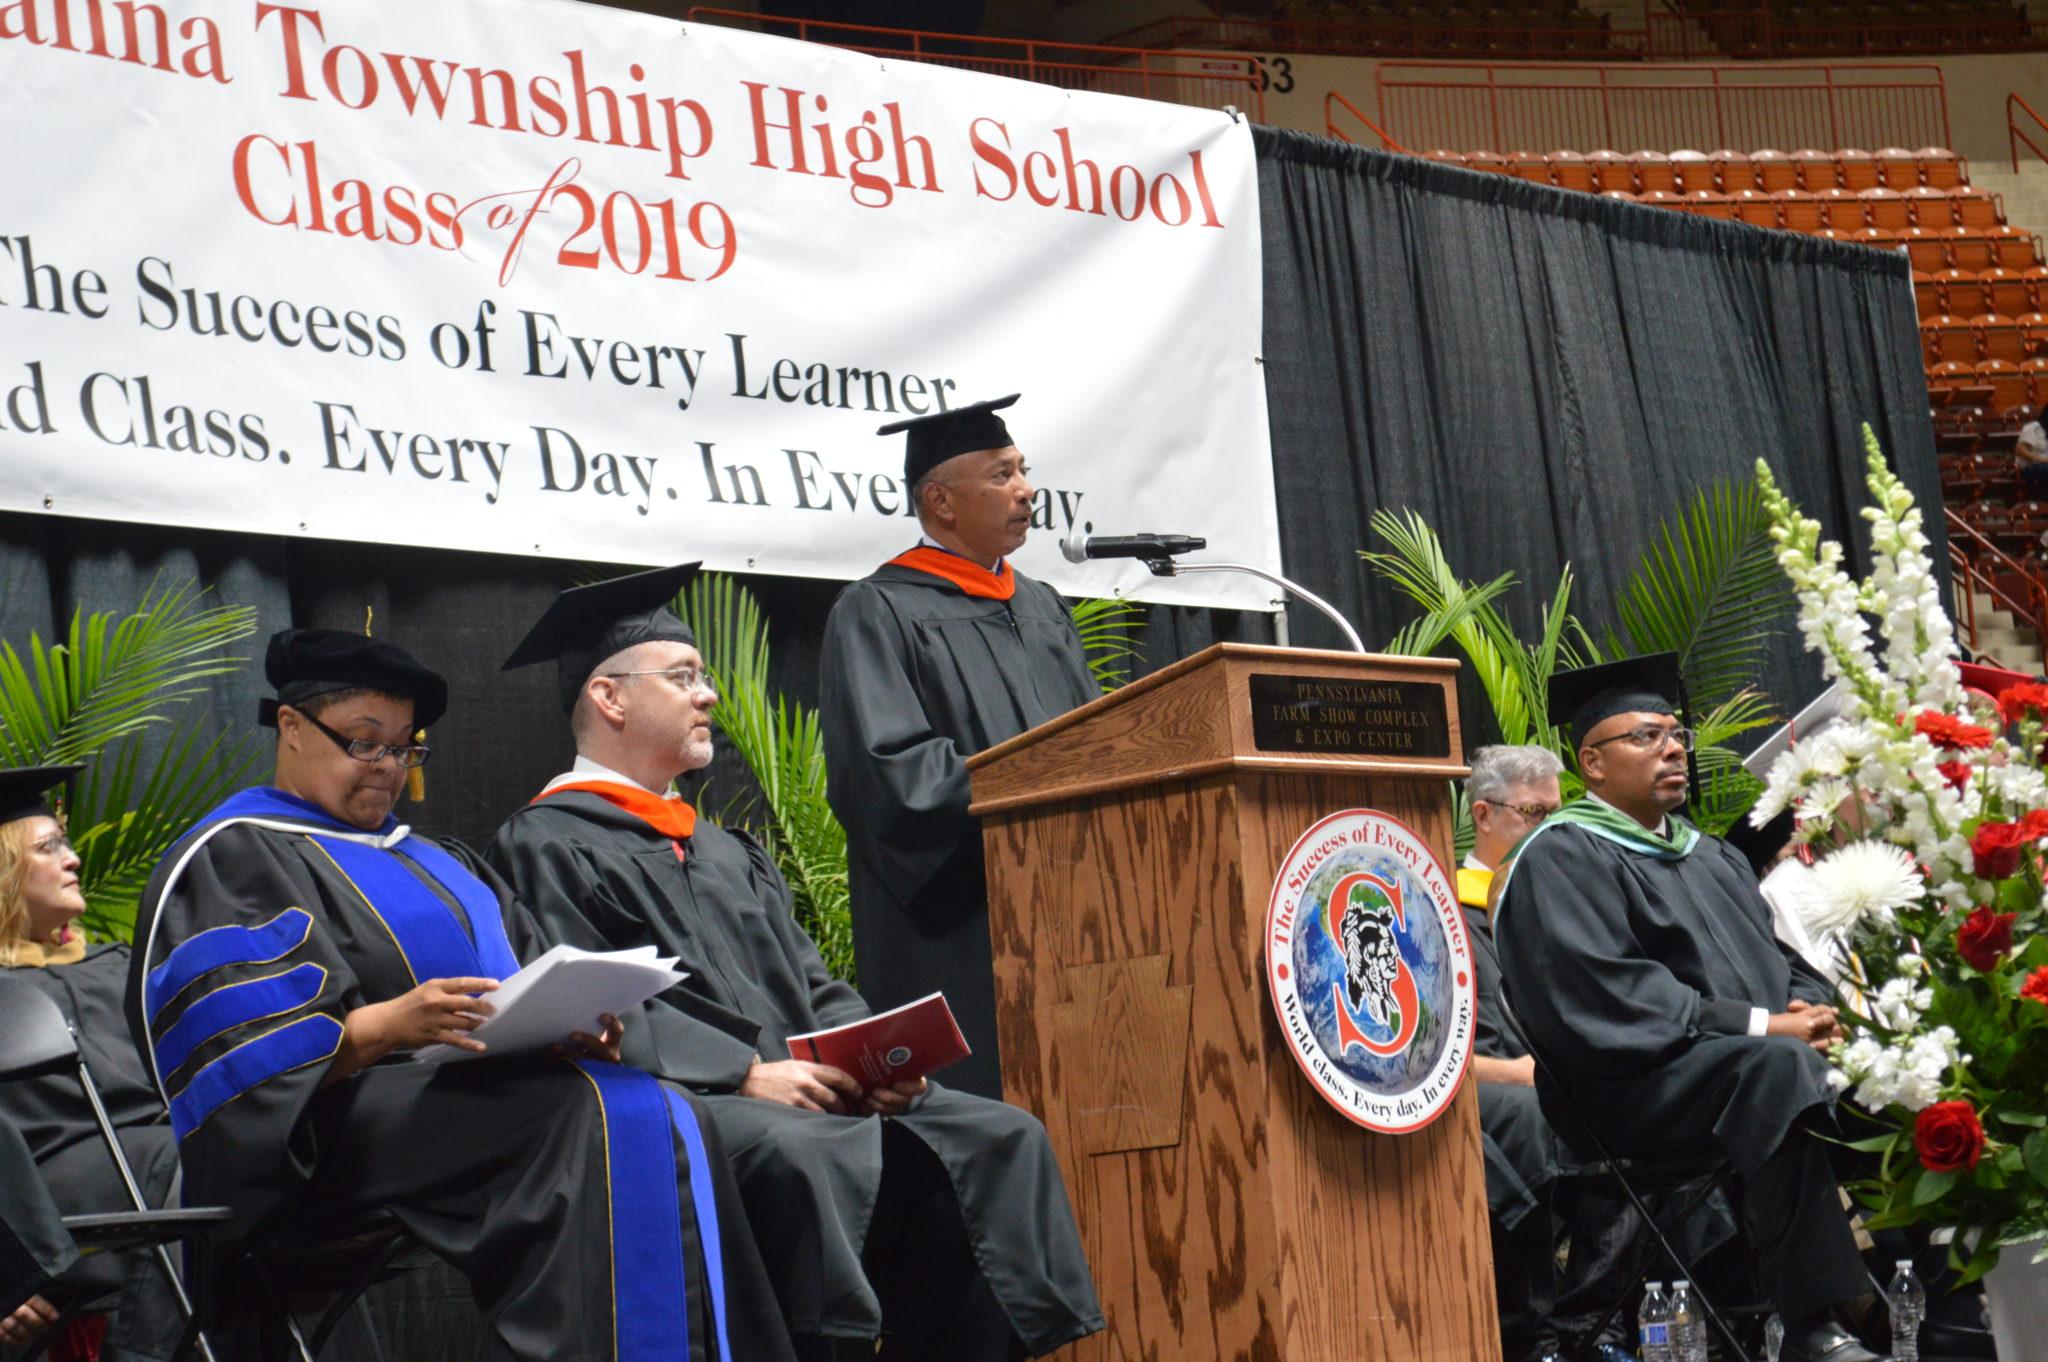 Dawood President Awarded Alumni Achievement Award